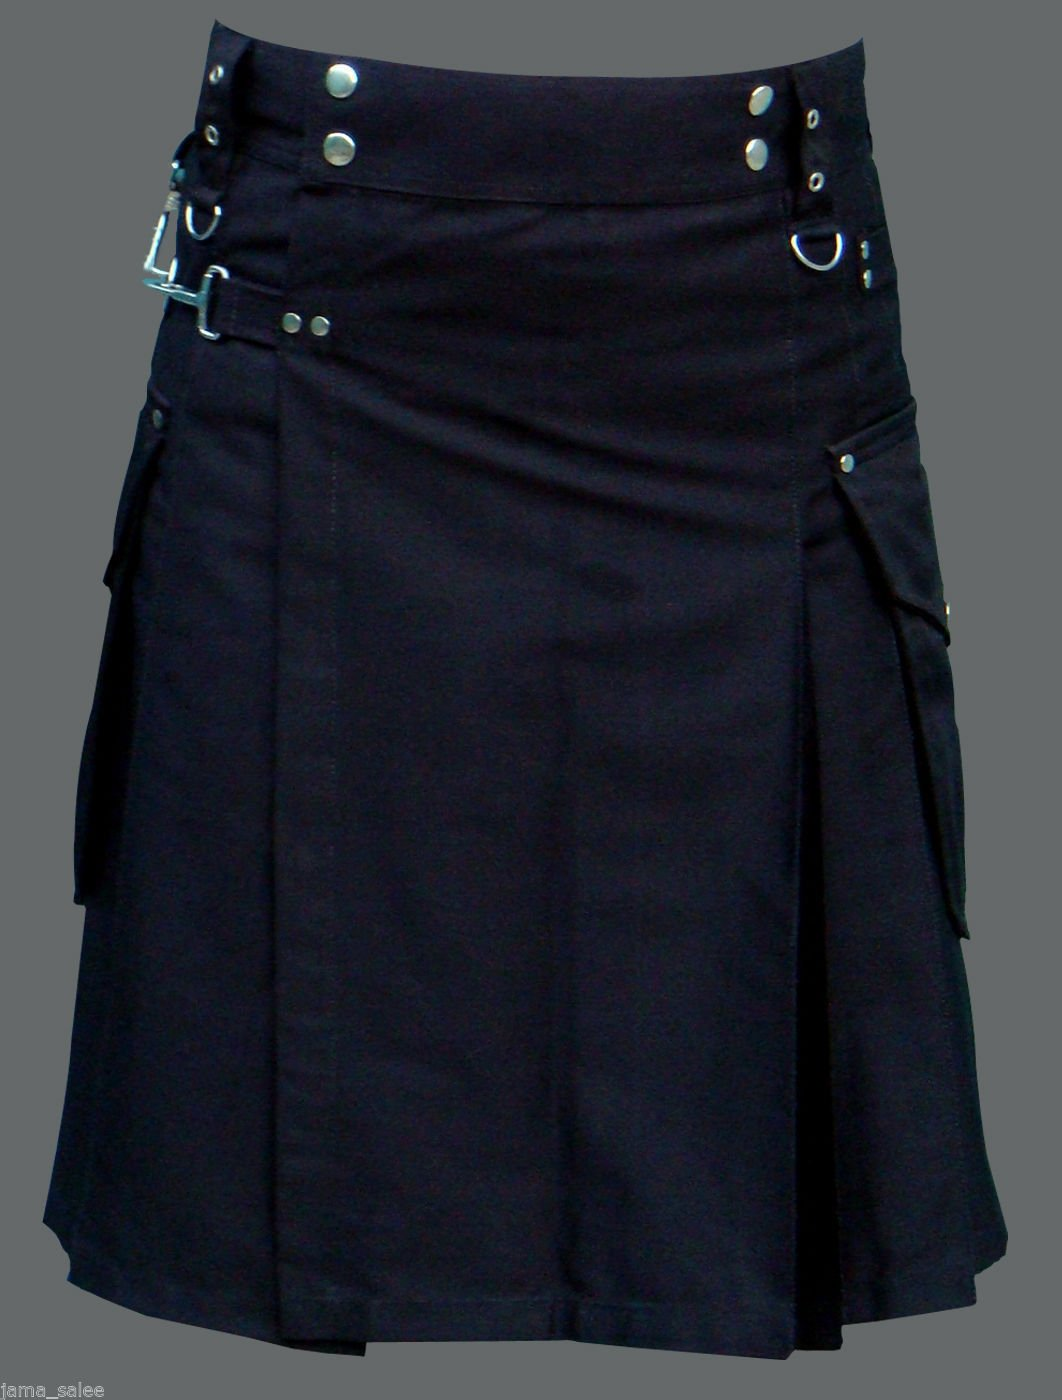 Men 48 Waist Handmade Black Deluxe Utility Kilt 100% Cotton With Cargo Pockets